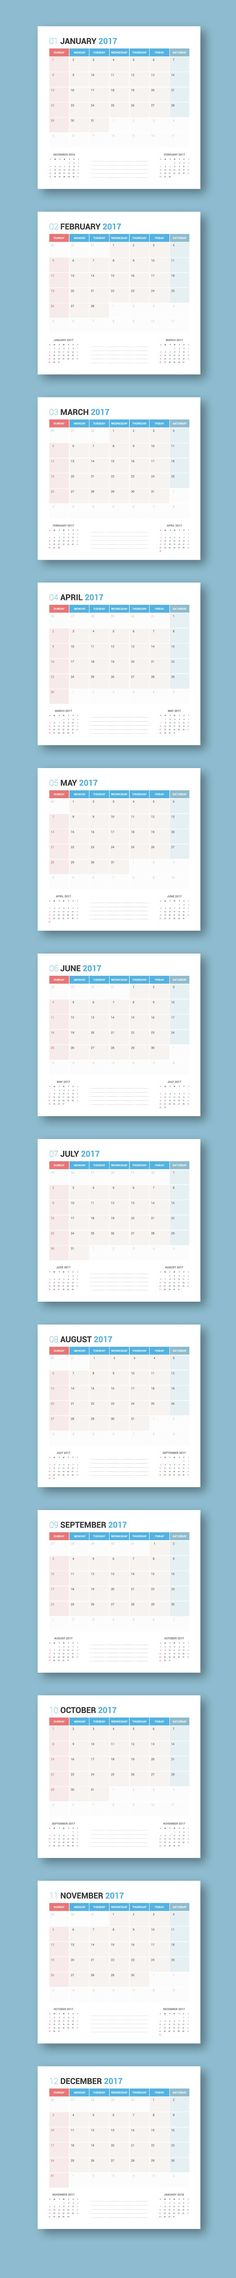 Cool Calendar 2017 Planner Design Creativework247 Fonts Graphics